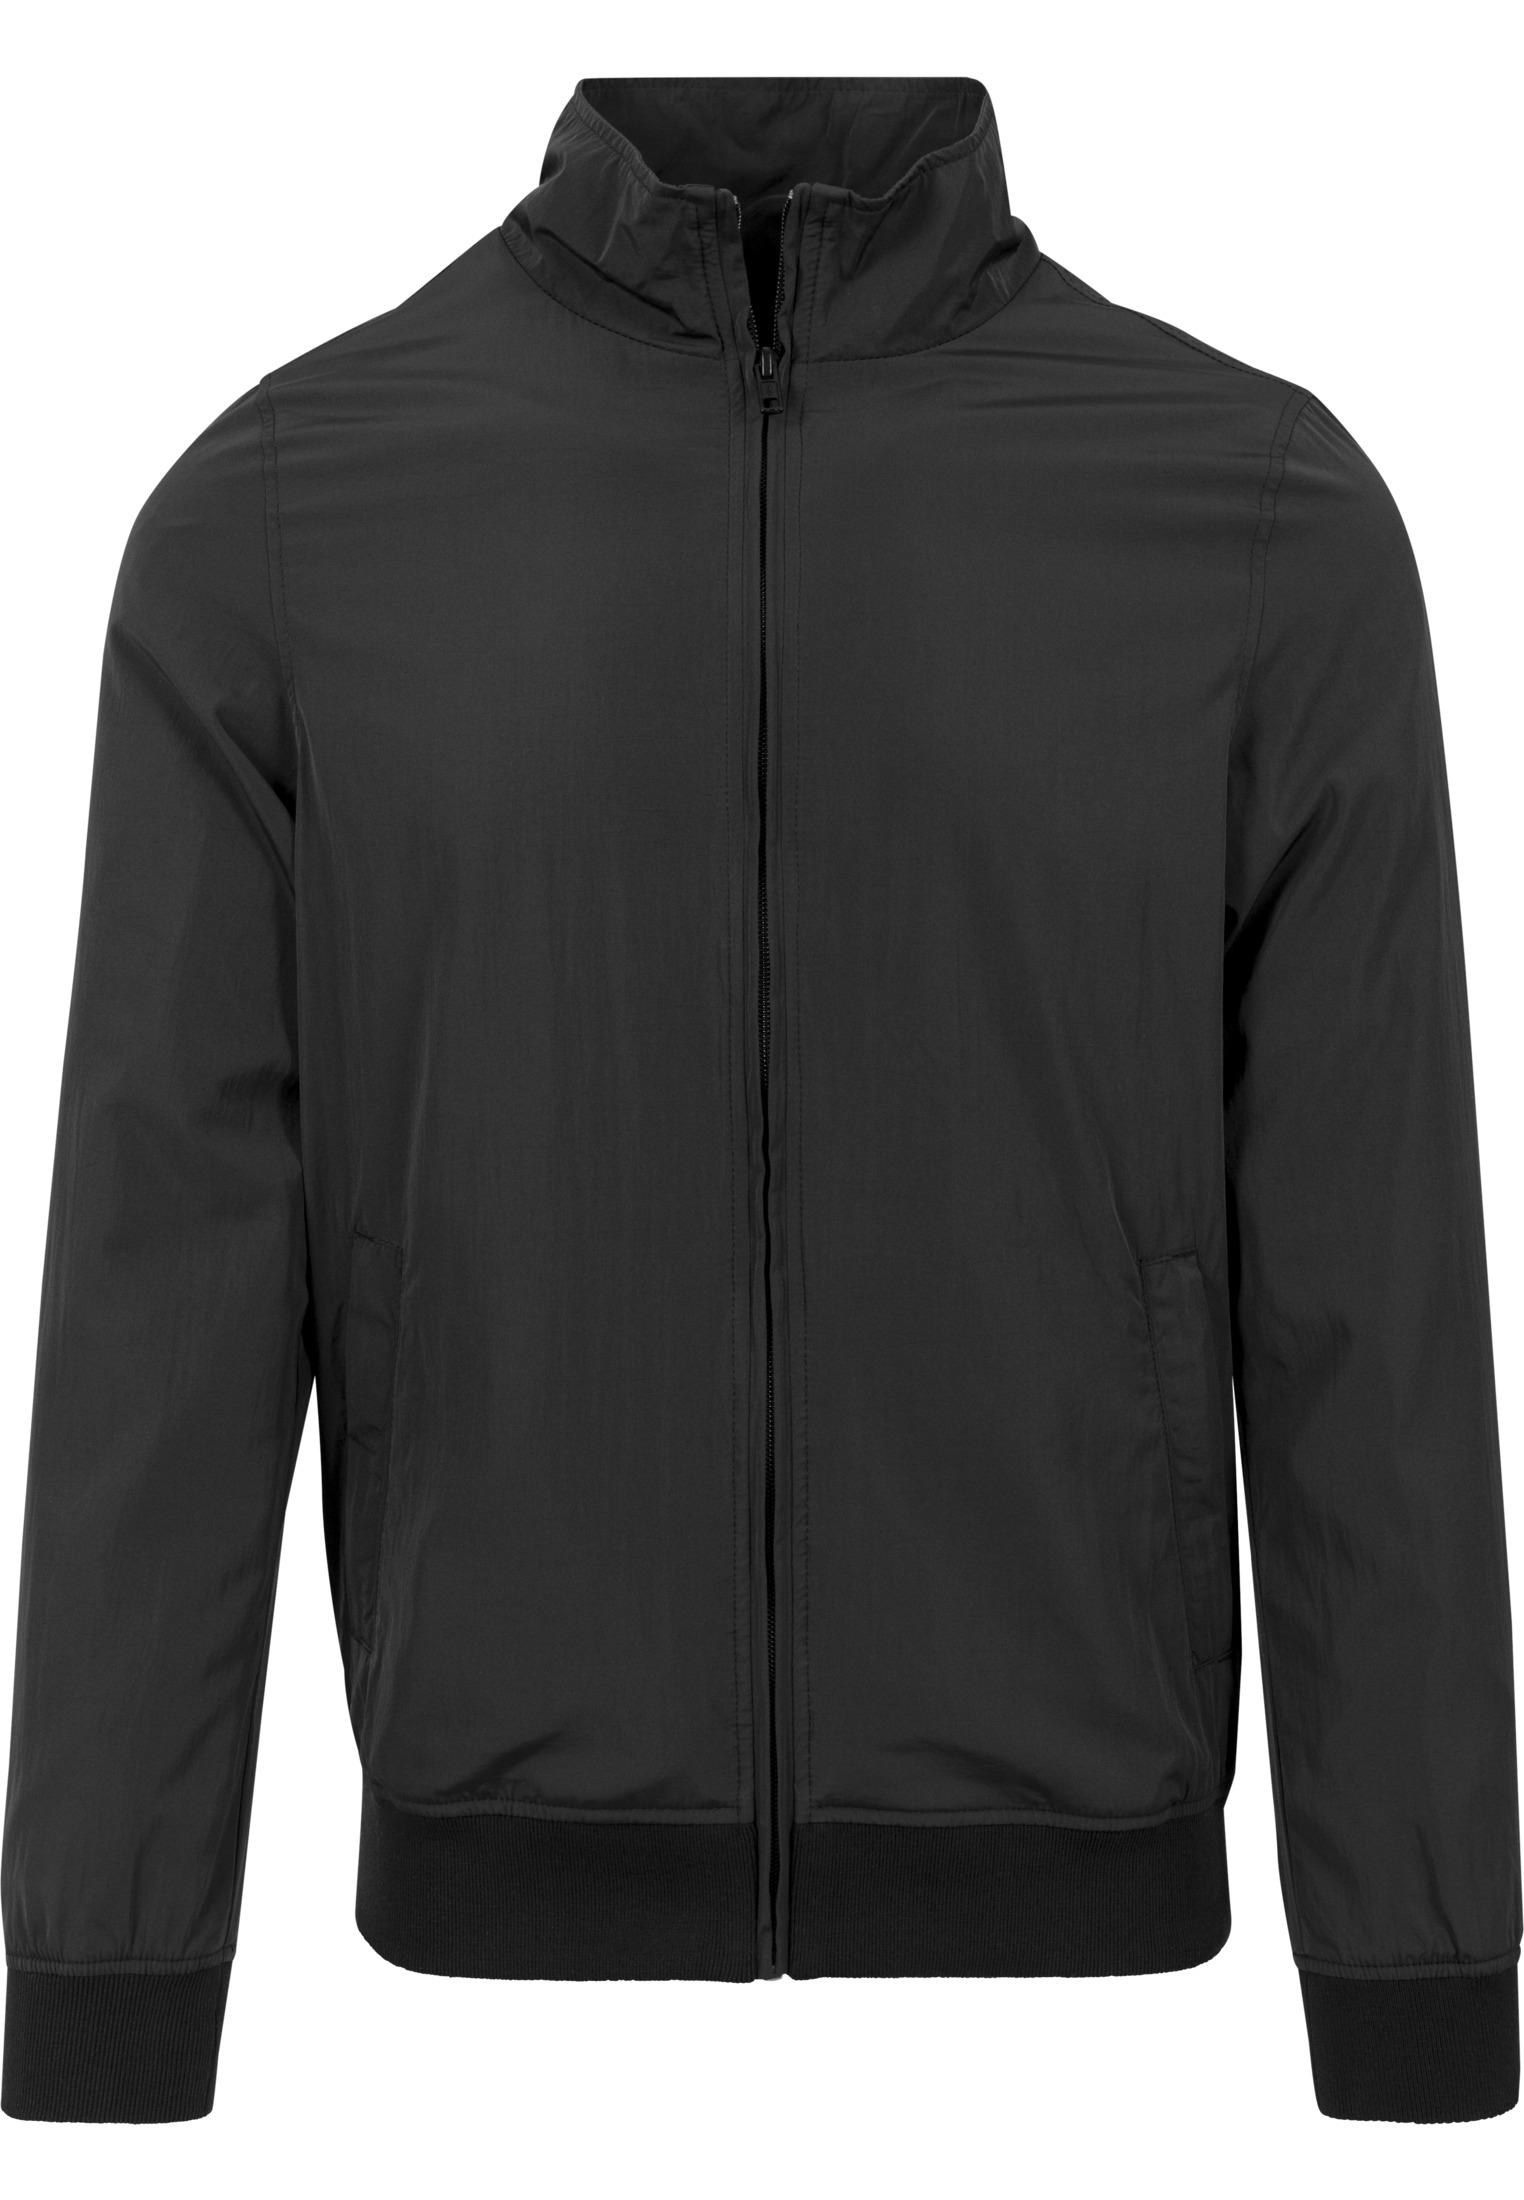 Urban Classics Nylon Training Jacket Giacca Uomo